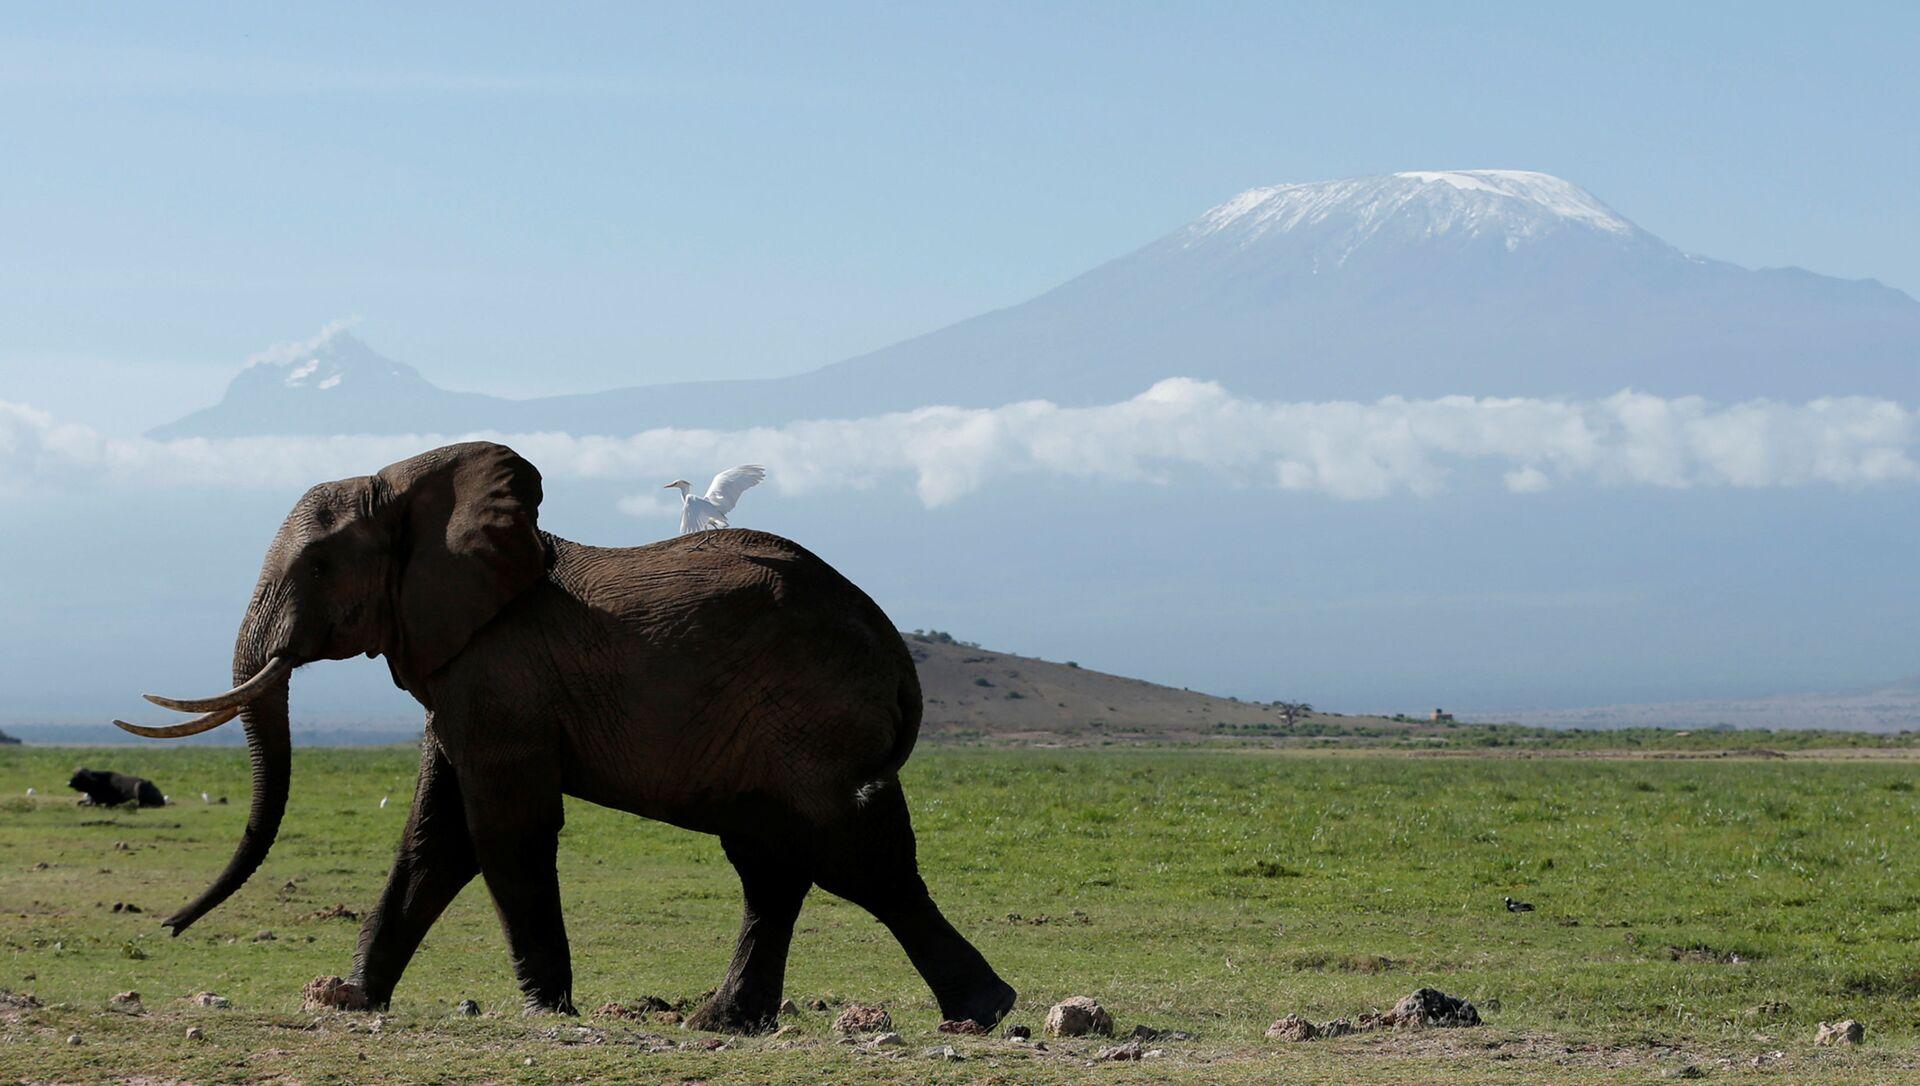 Kenya. Con voi trong công viên quốc gia Amboseli, phía sau là núi Kilimanjaro. - Sputnik Việt Nam, 1920, 11.08.2021